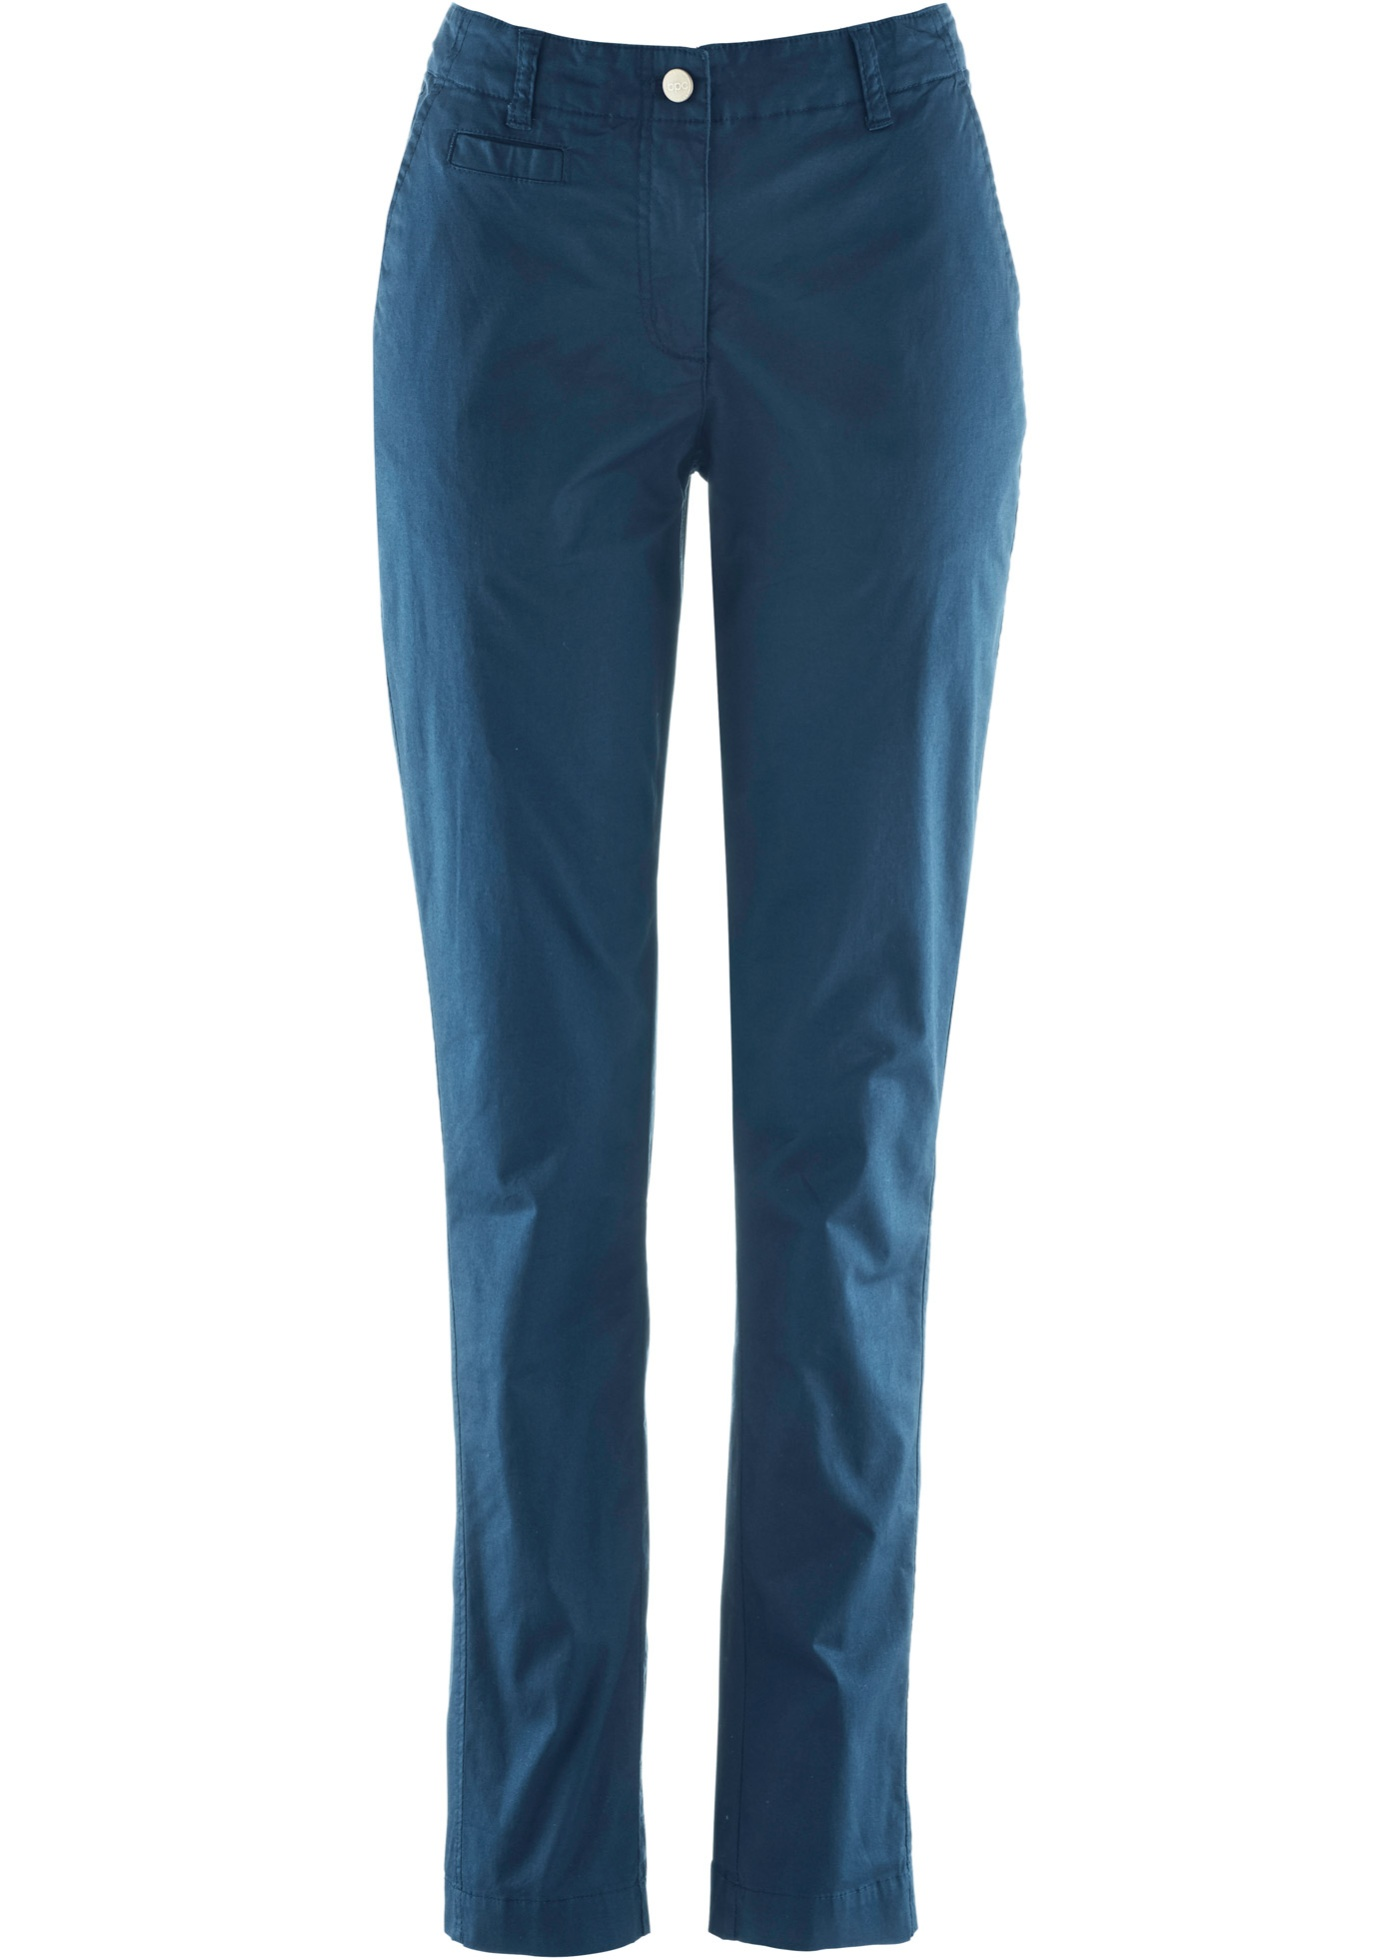 Pour CollectionPantalon Bpc Bonprix Réglable Chino Bleu Femme Taille Avec ZXTuPiOk